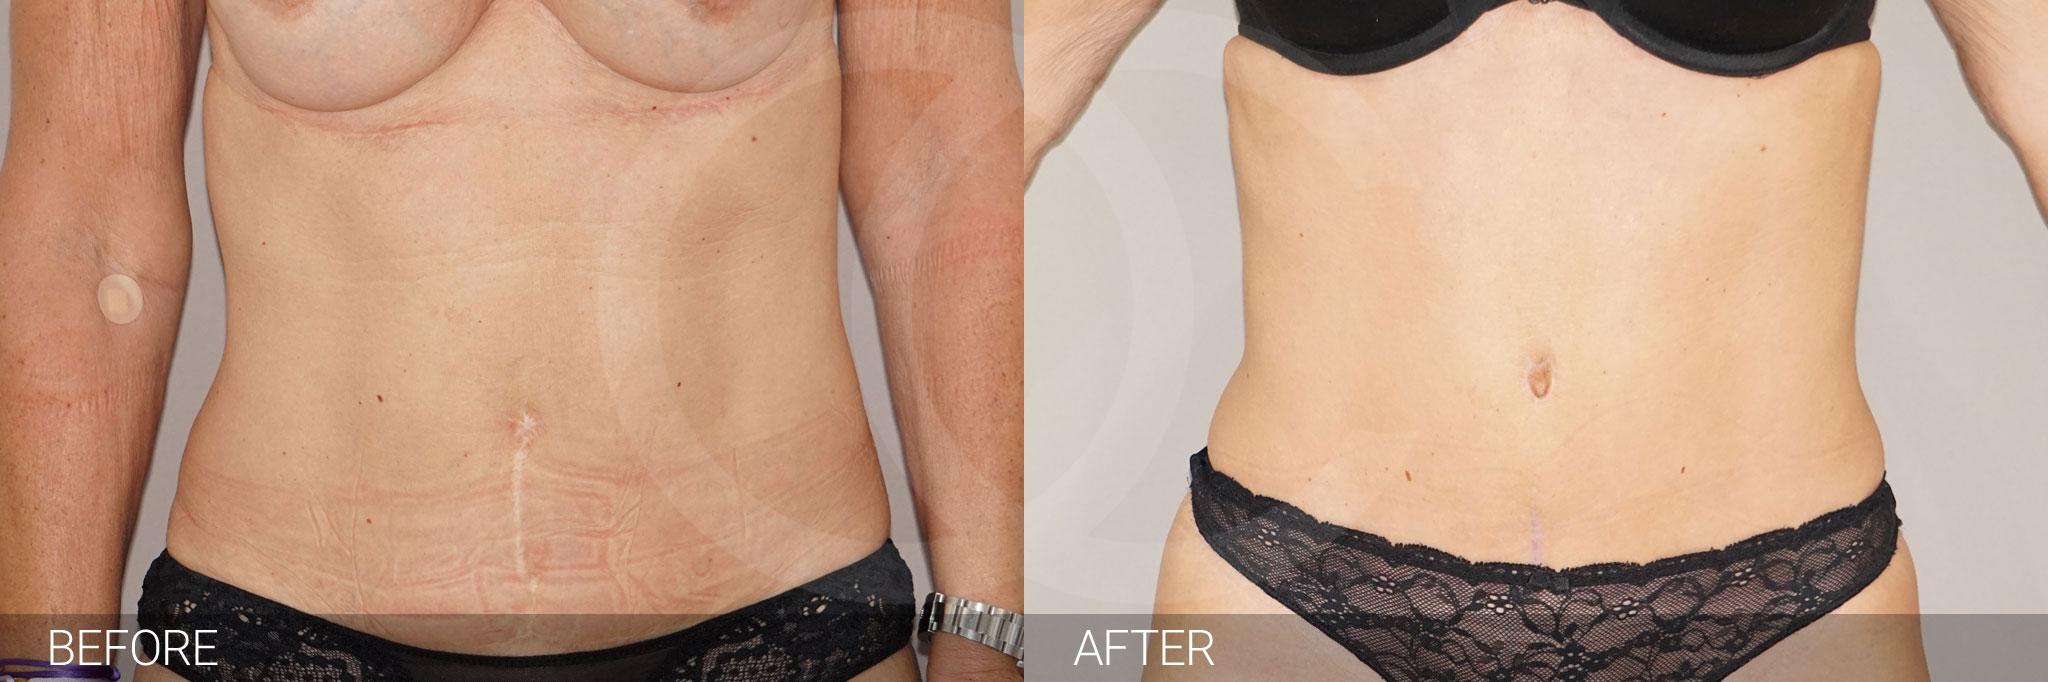 Abdominoplastia reducir de abdomen ante/post-op I